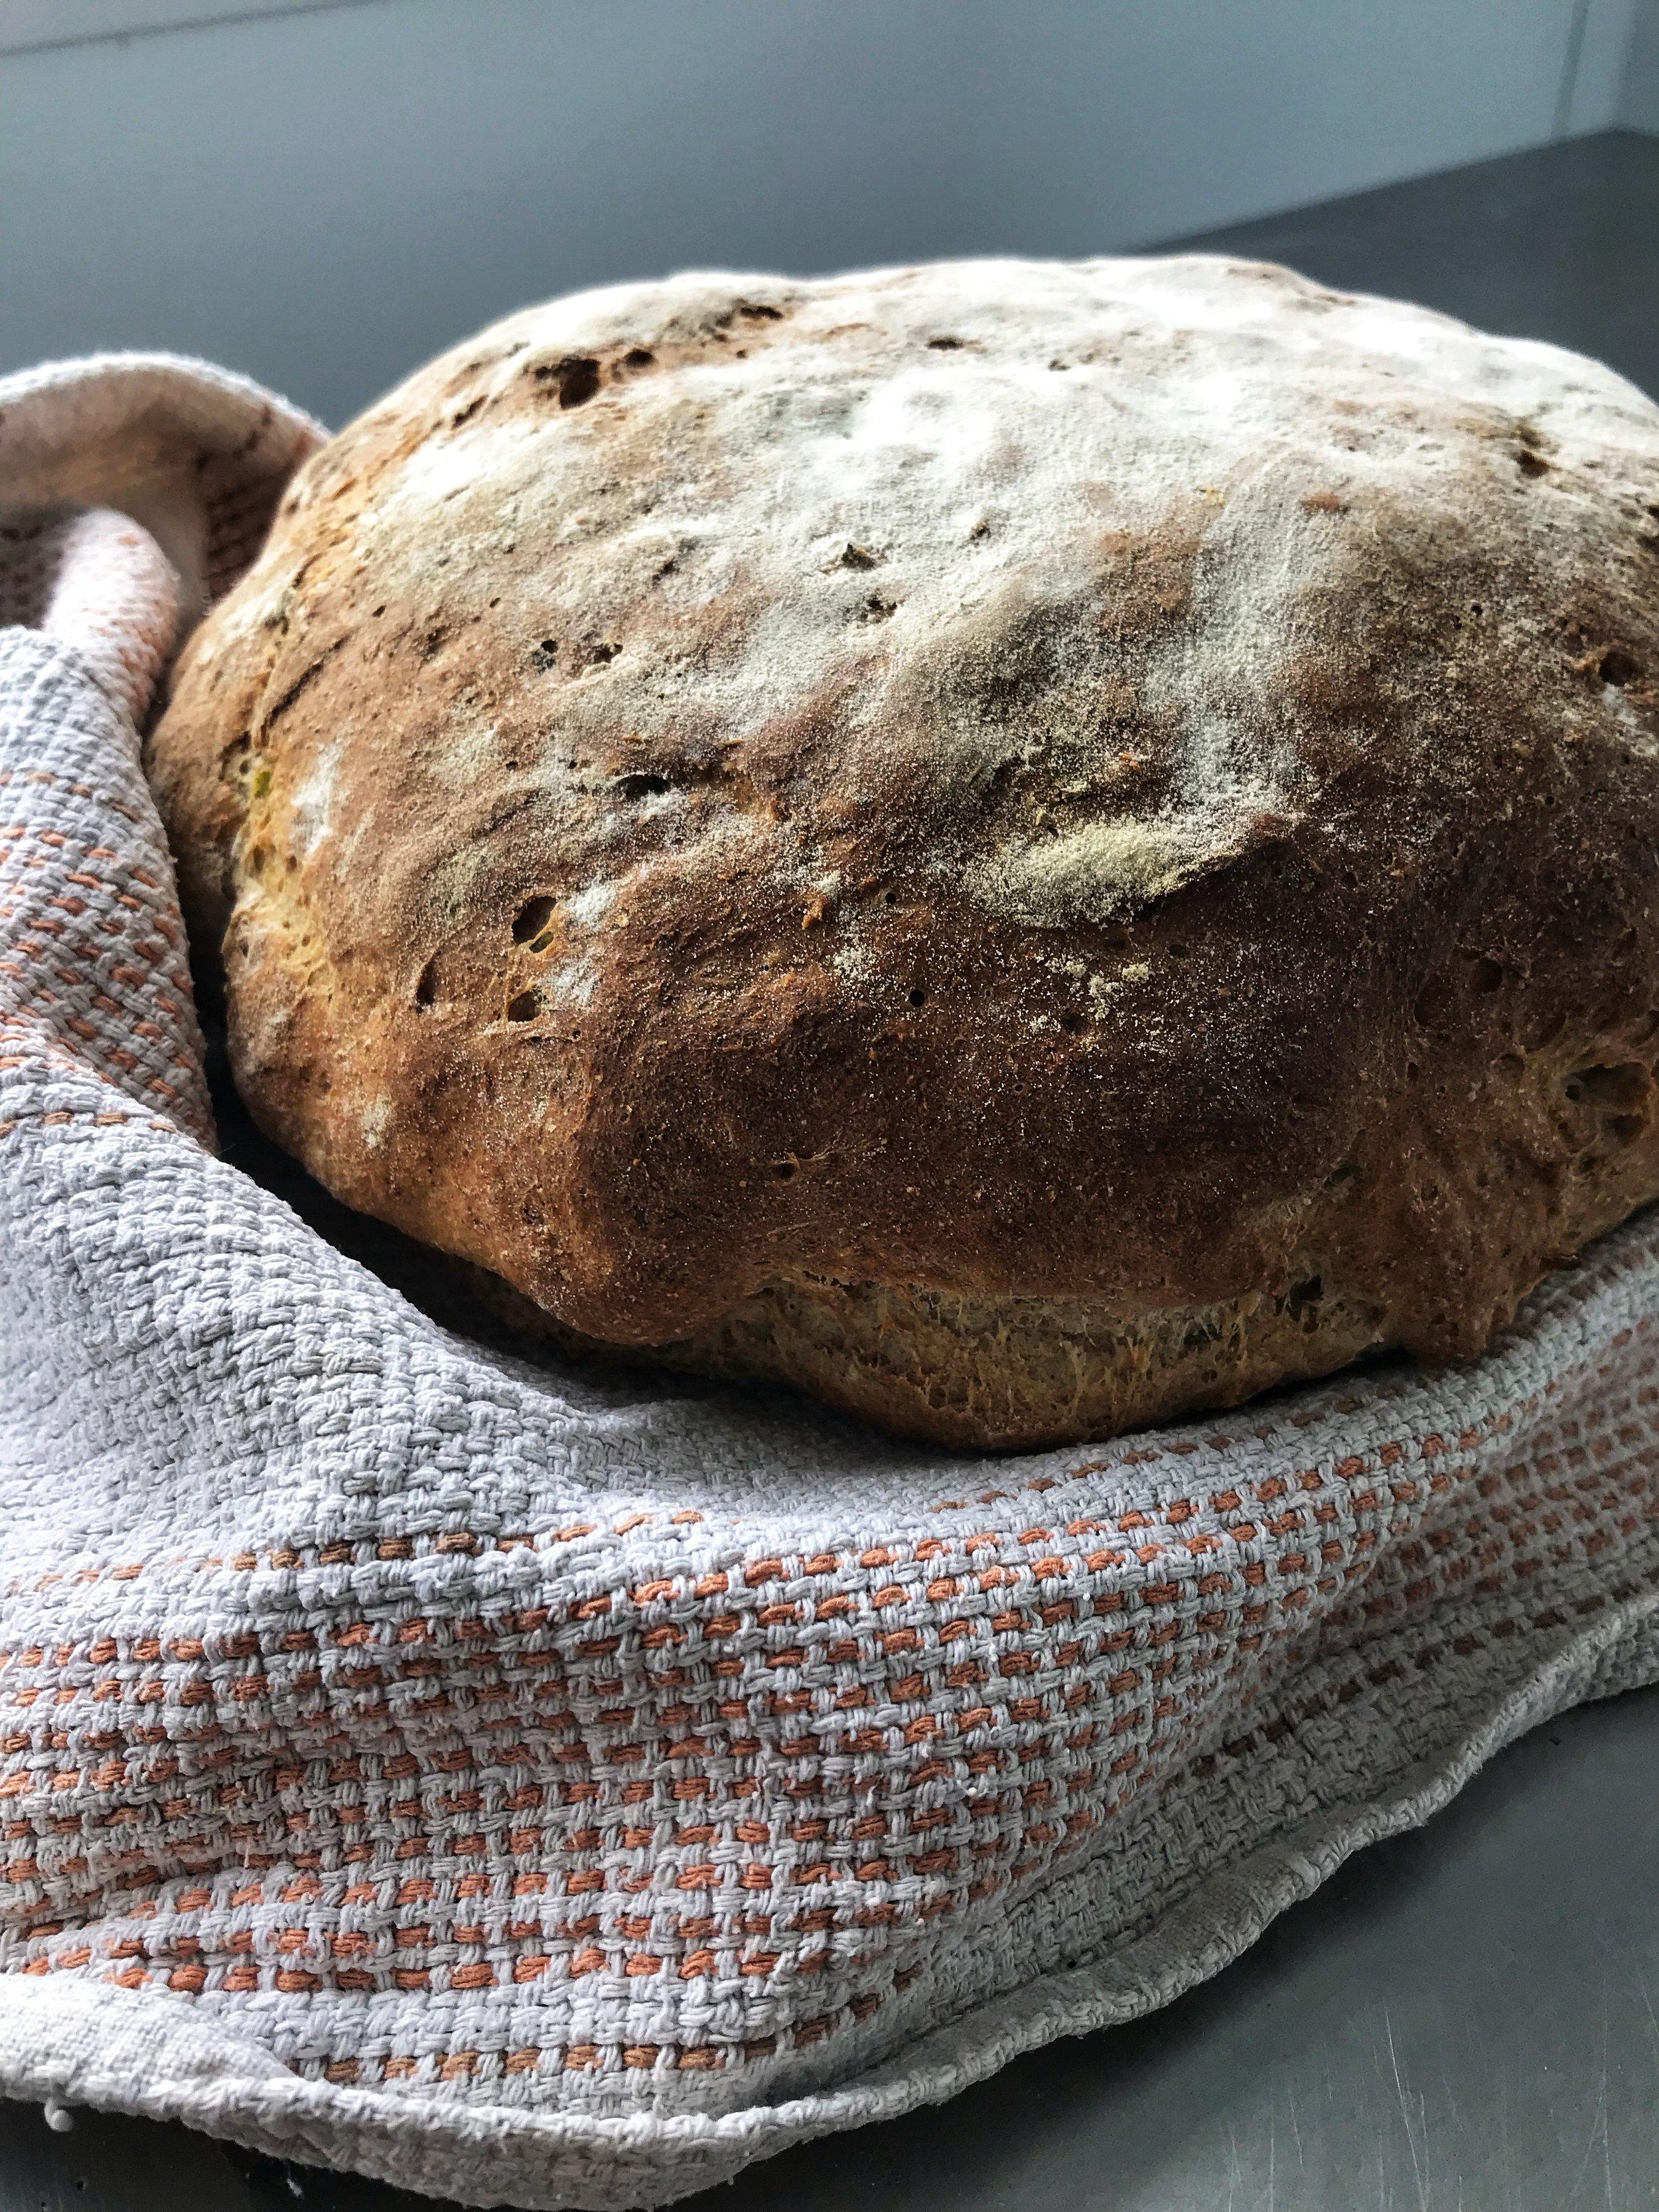 Sea Grass, Mint and Marjoram Yeast Bread - Yeast Bread